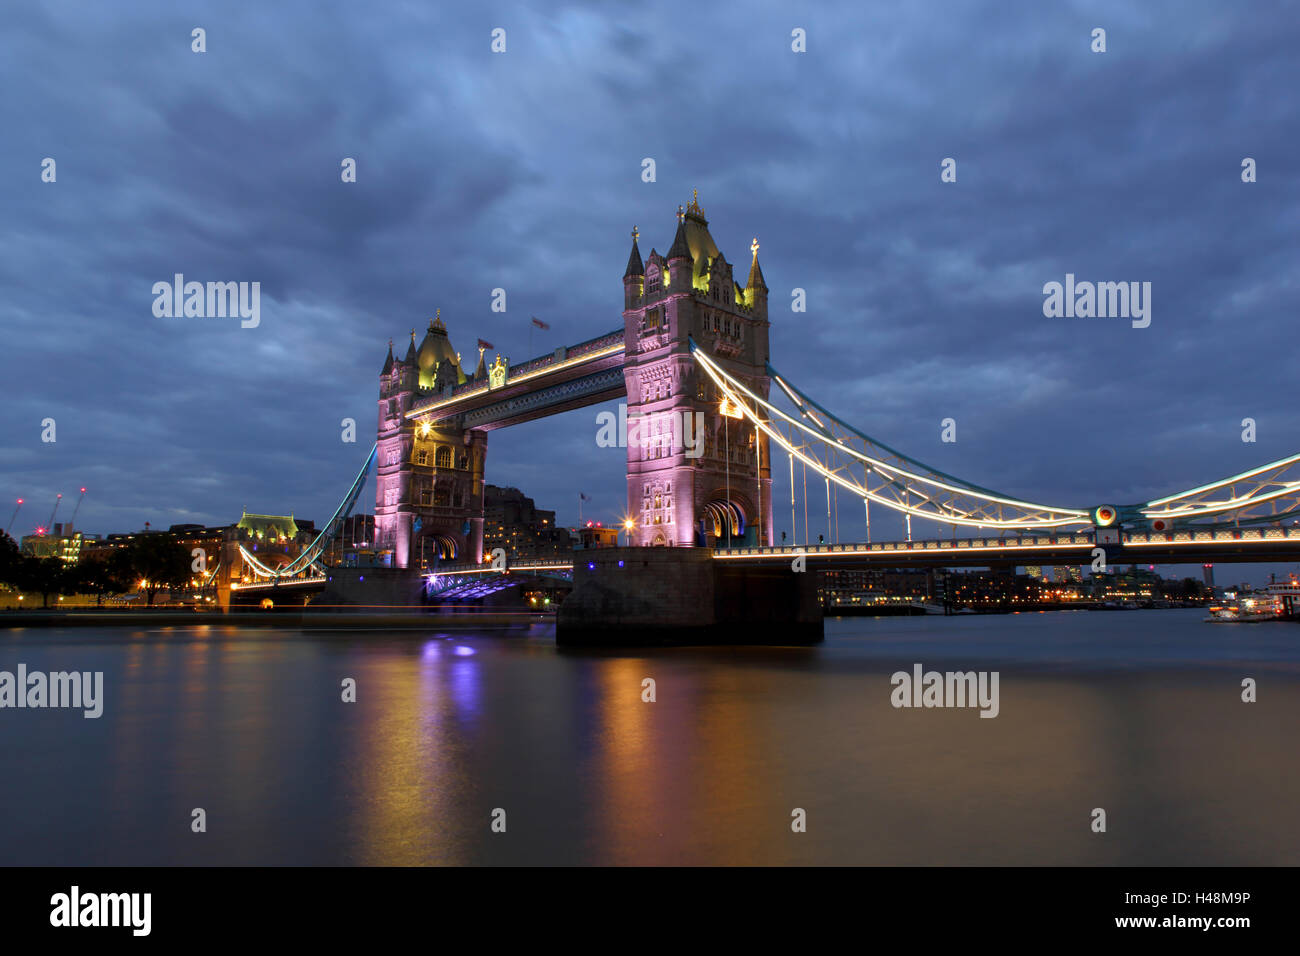 Tower Bridge London lit with purple lighting - Stock Image